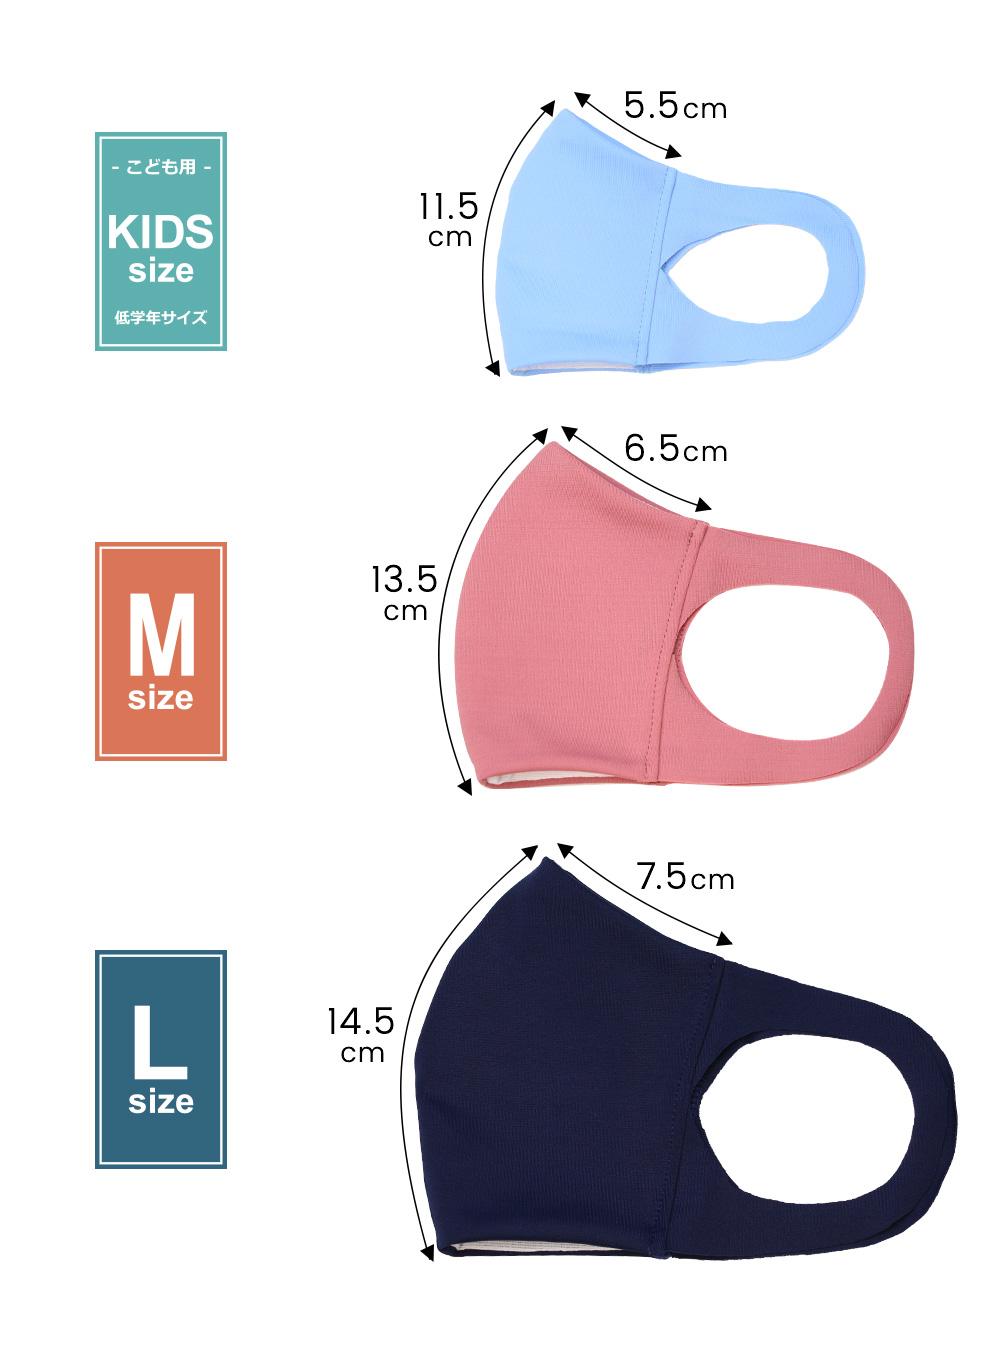 SIZE|こども用 KIDS size 低学年サイズ 11.5cm 5.5cm Msize 13.5cm 6.5cm 14.5cm 7.5cm